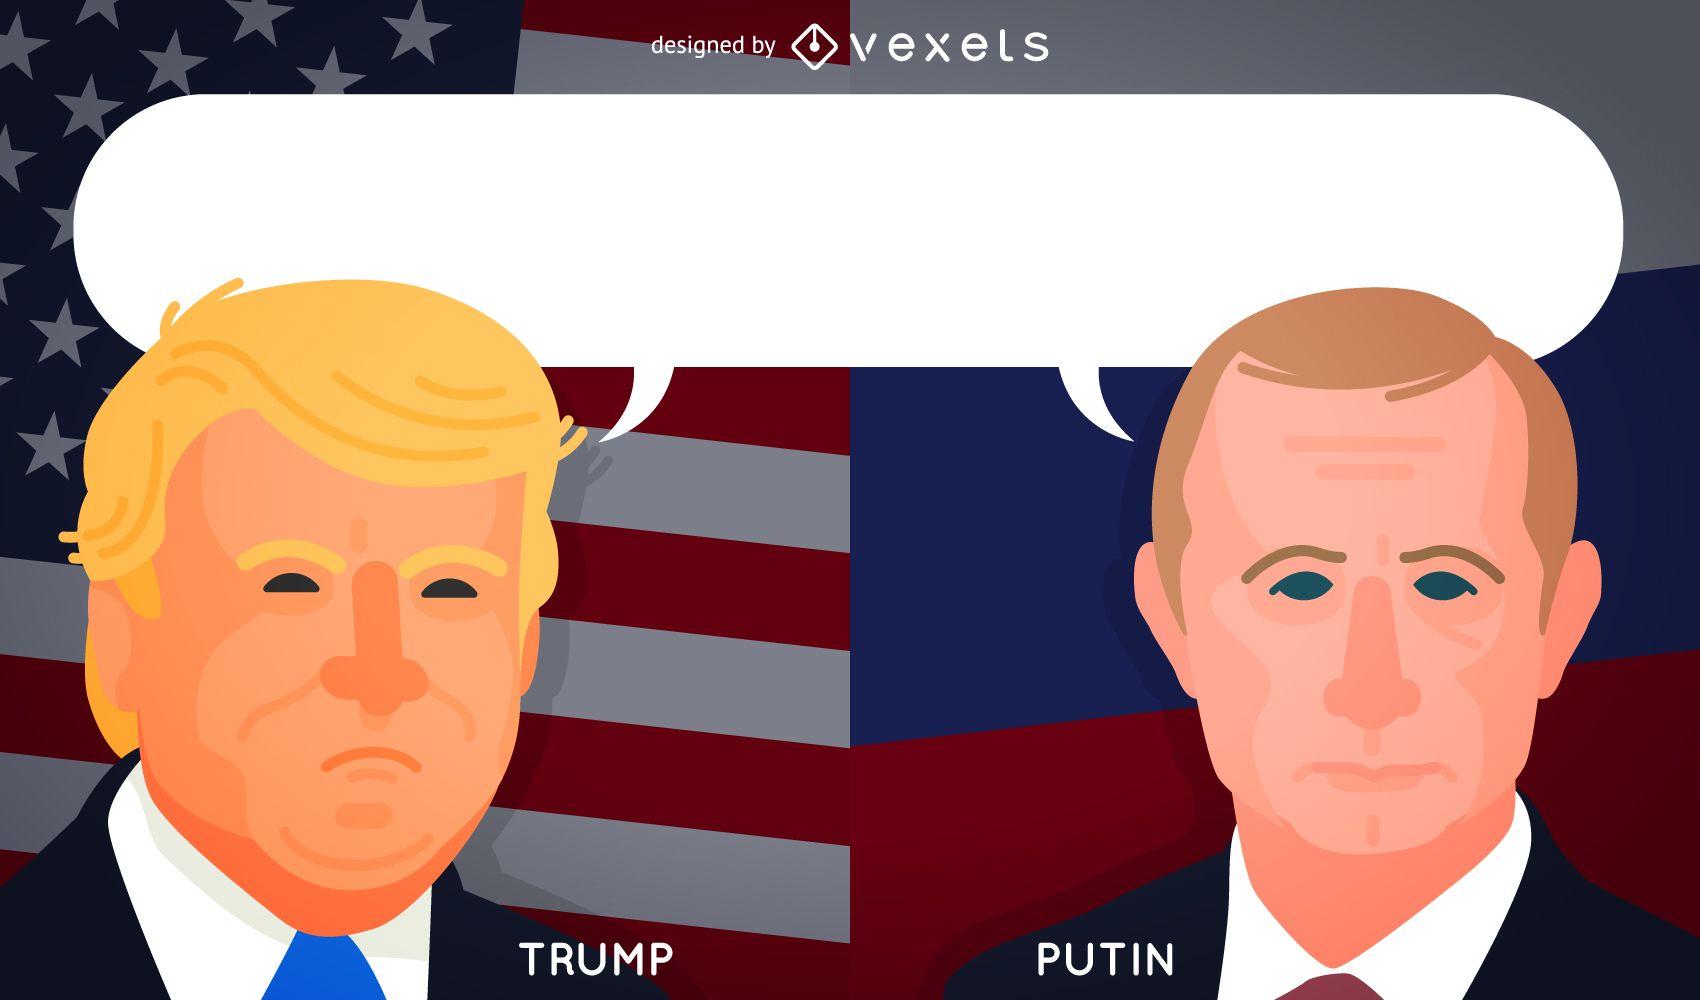 Trump and Putin cartoons for articles